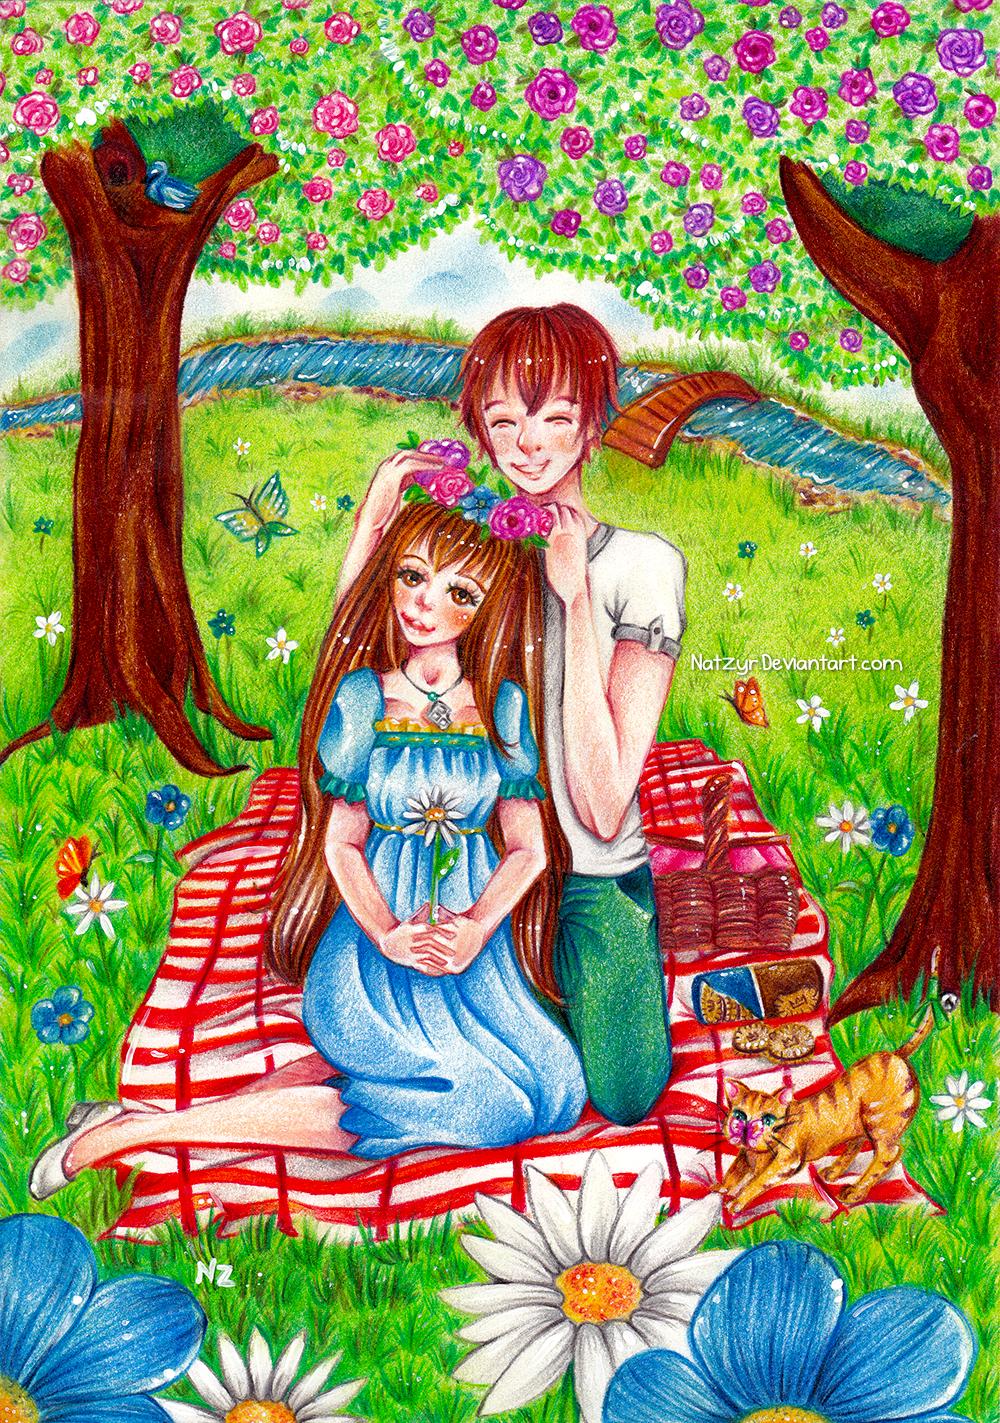 http://fc00.deviantart.net/fs71/f/2014/108/2/c/be_my_princess_by_natzyr-d7adgkc.png